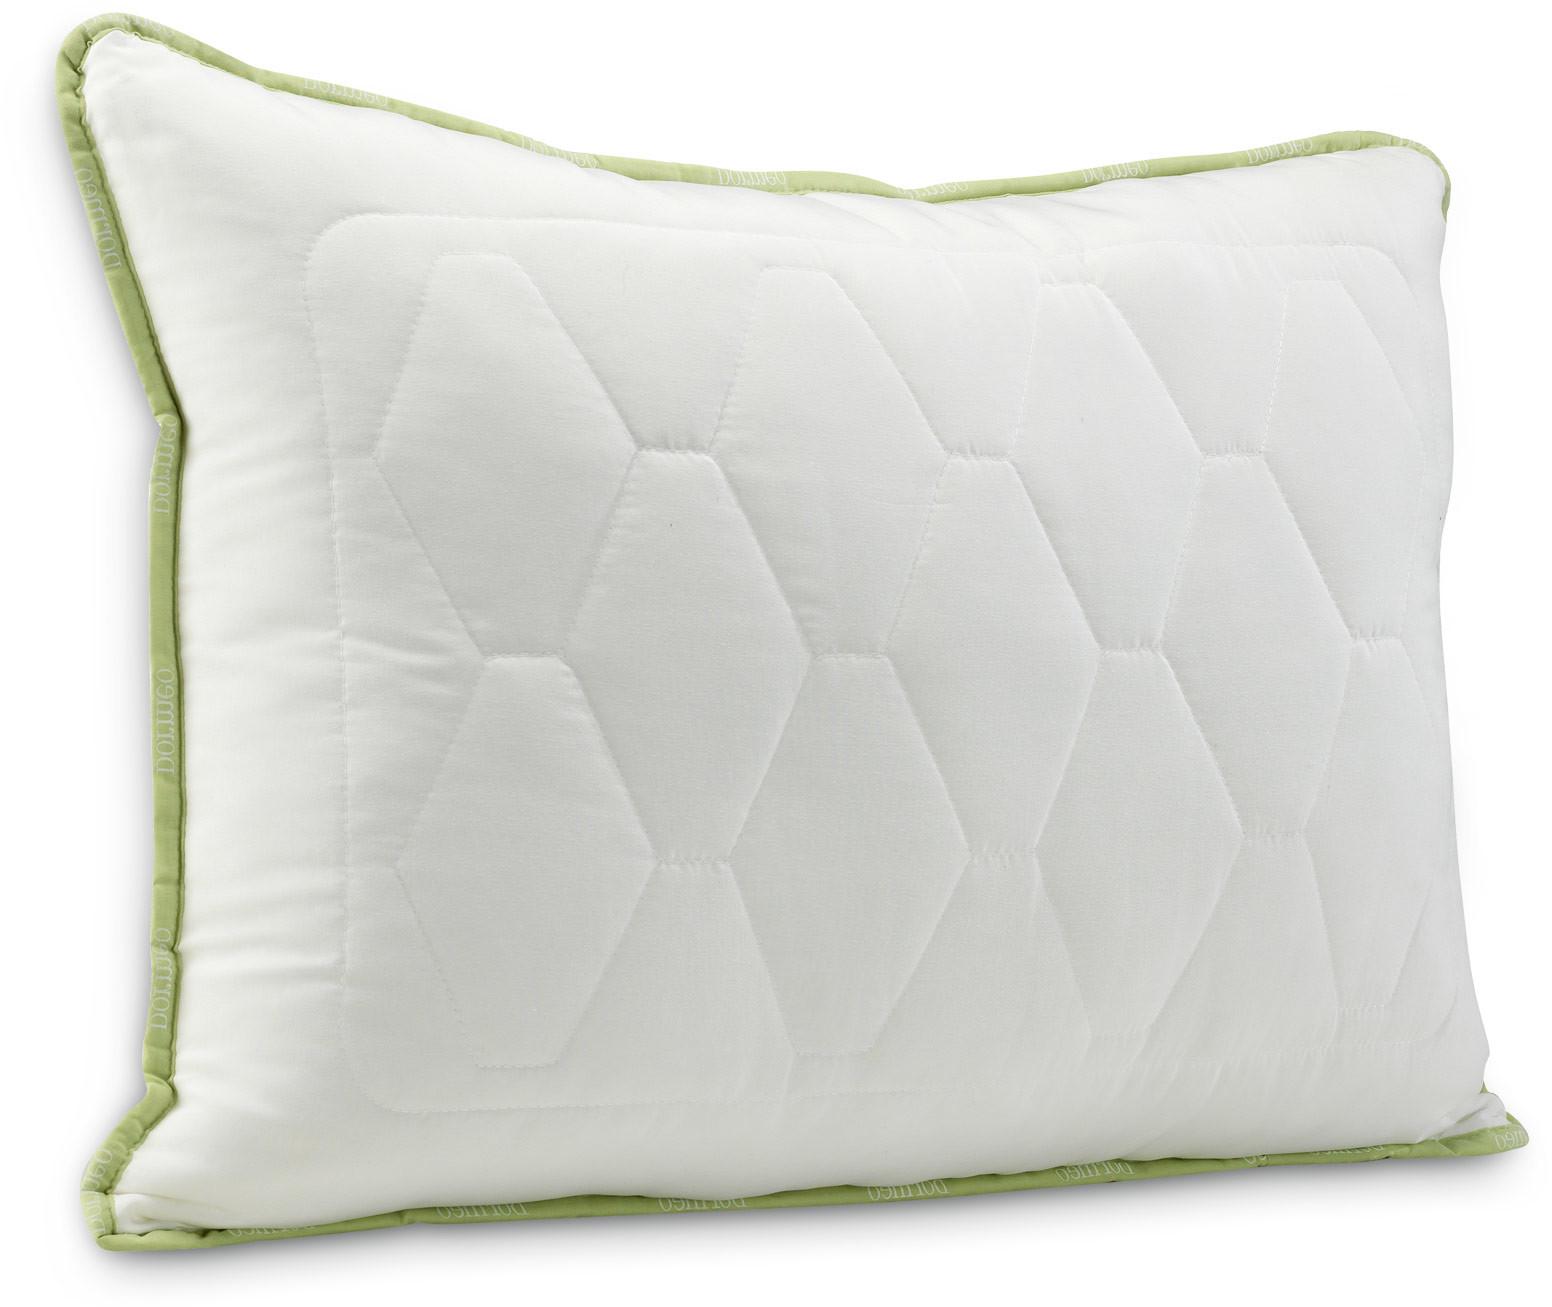 Dormeo Poduszka klasyczna Aloe Vera 106039104